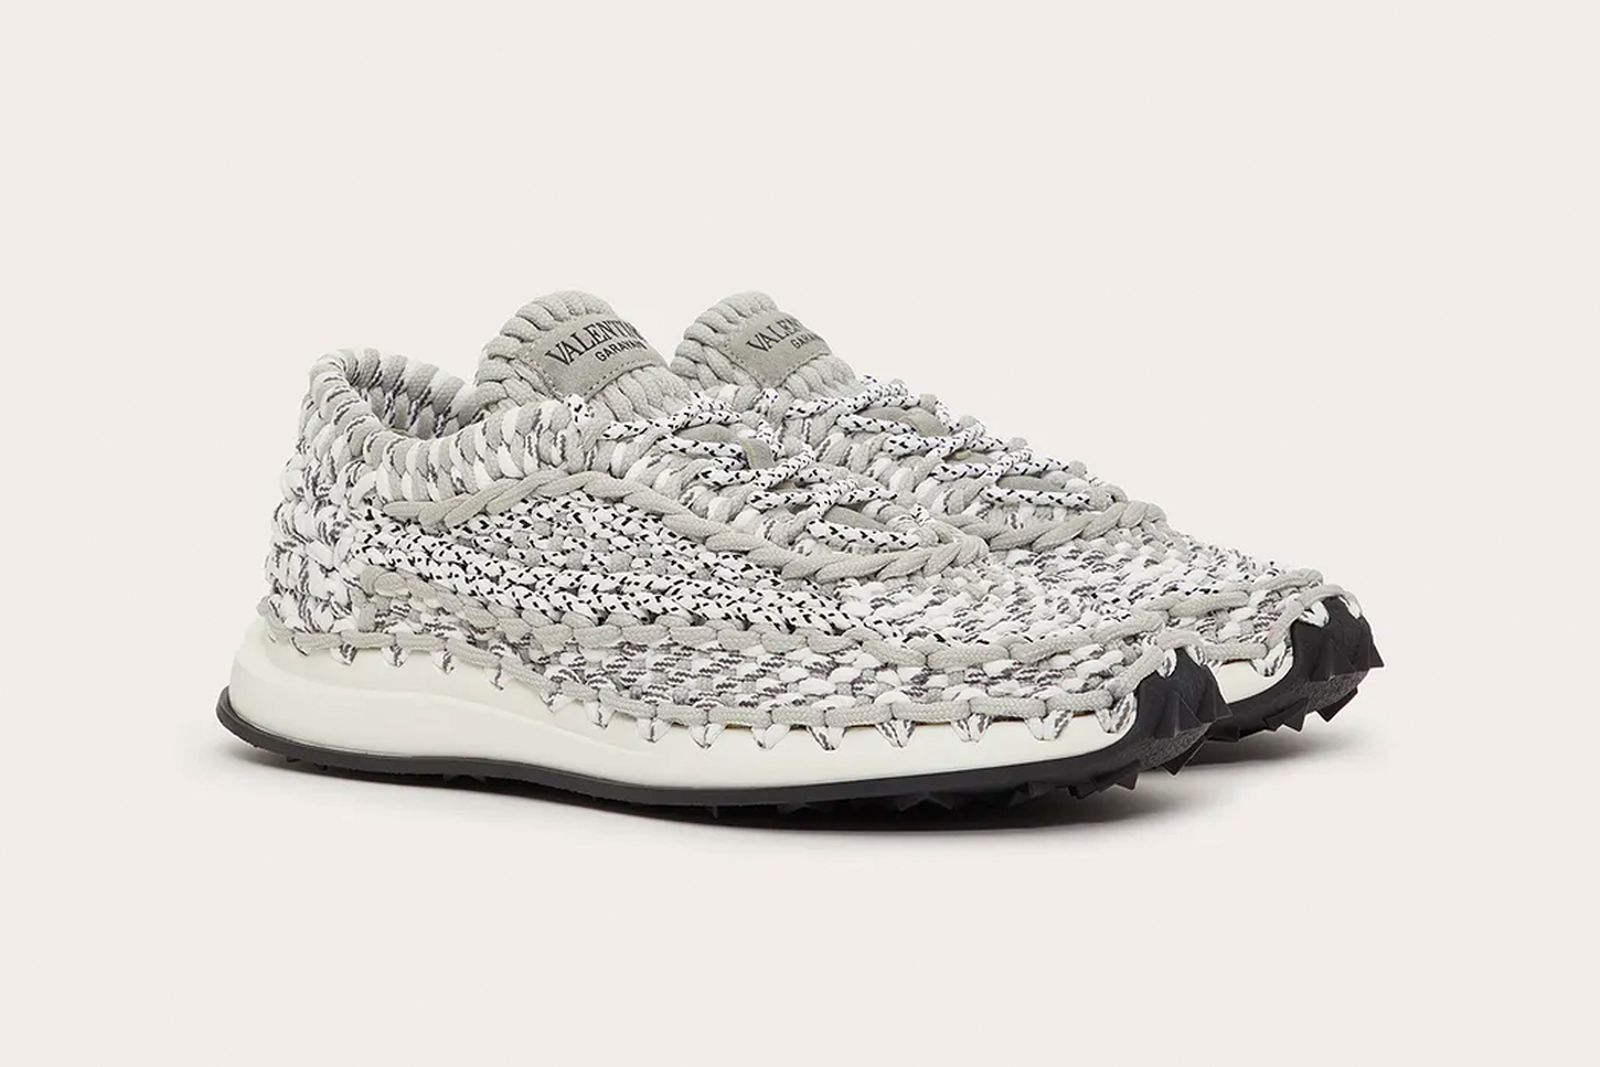 valentino-garavani-crochet-sneakers-release-date-price-05